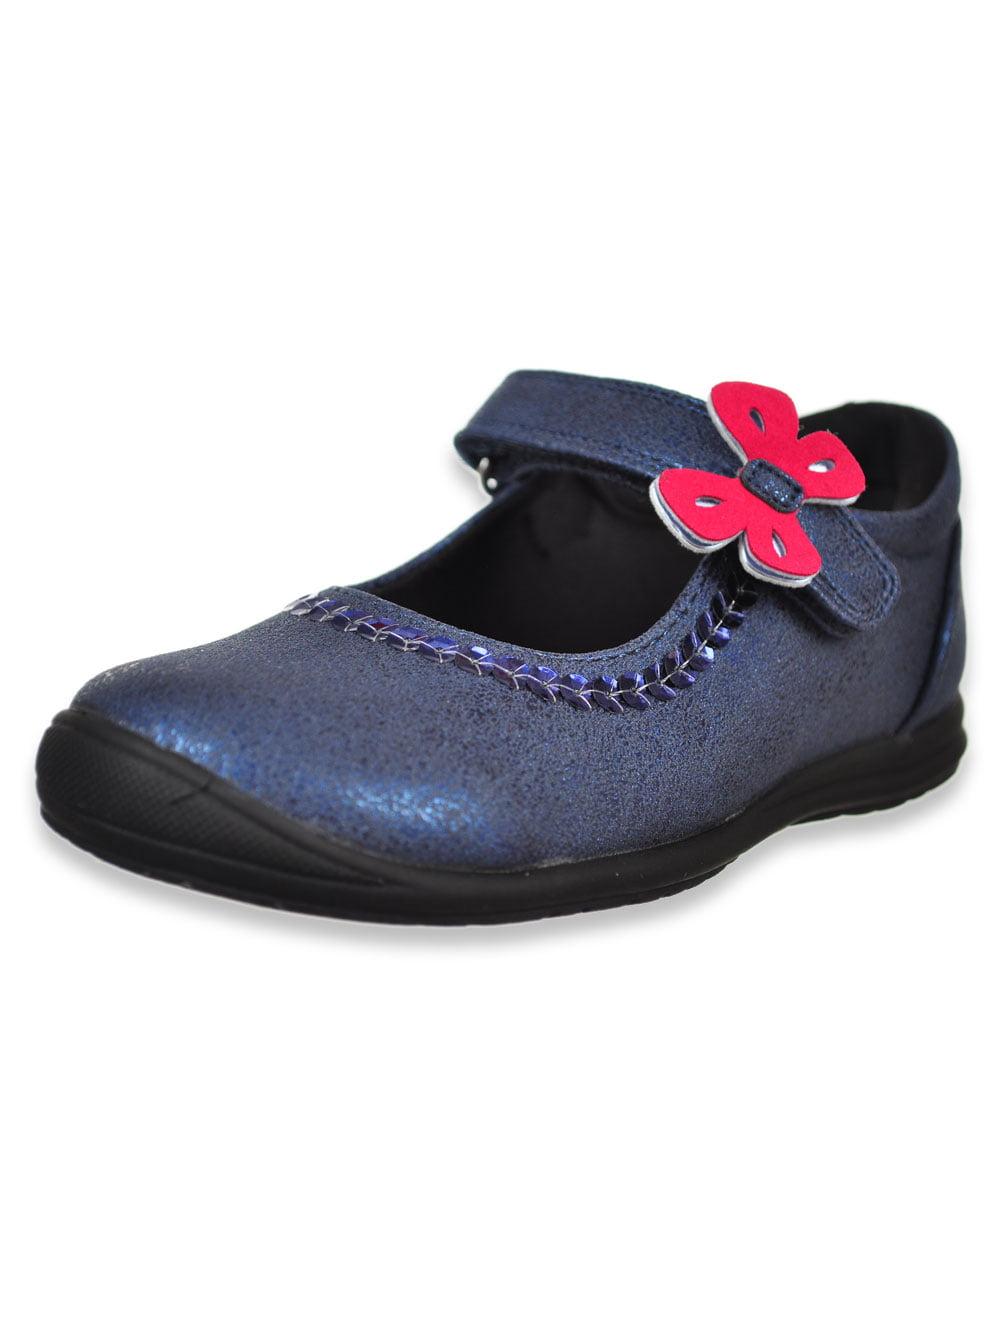 Girl Flat Shoes Micky Minnie Mouse Mary Jane Casual Uniform Dress Shoes Princess